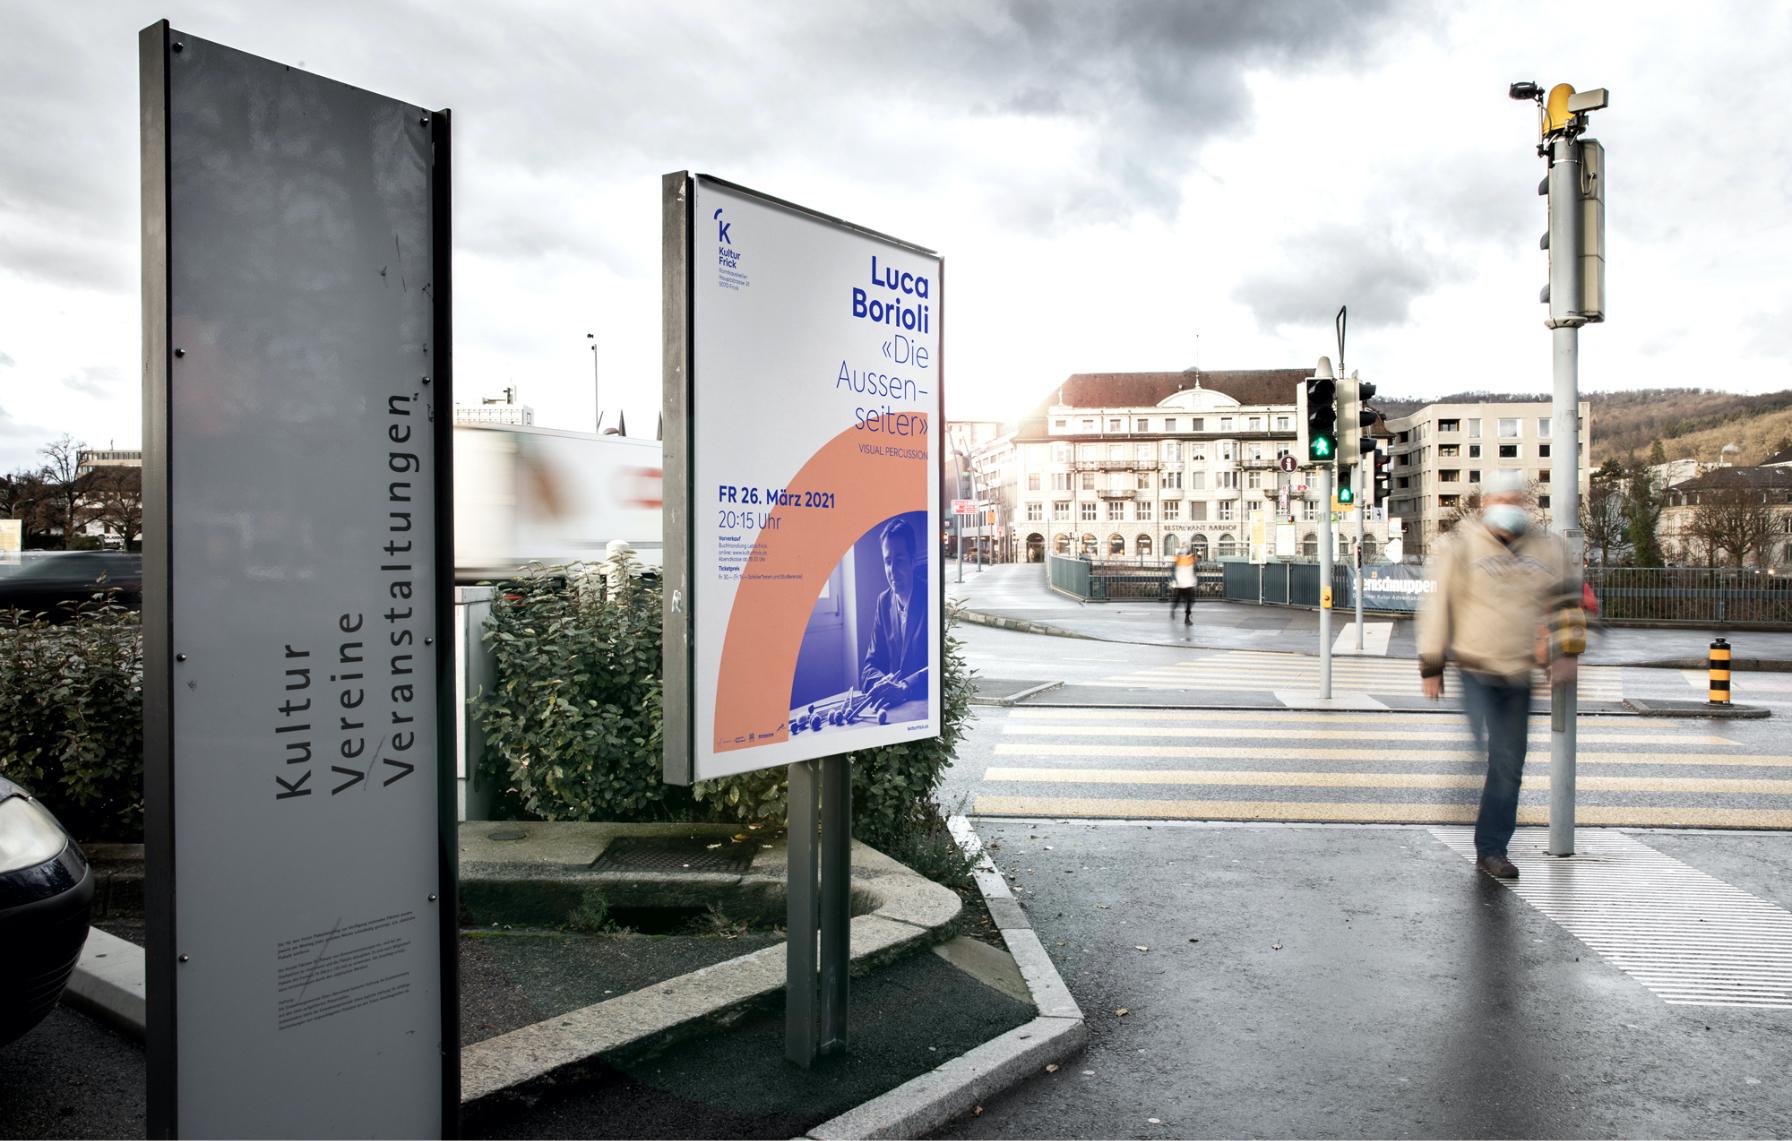 Plakat von Kultur Frick